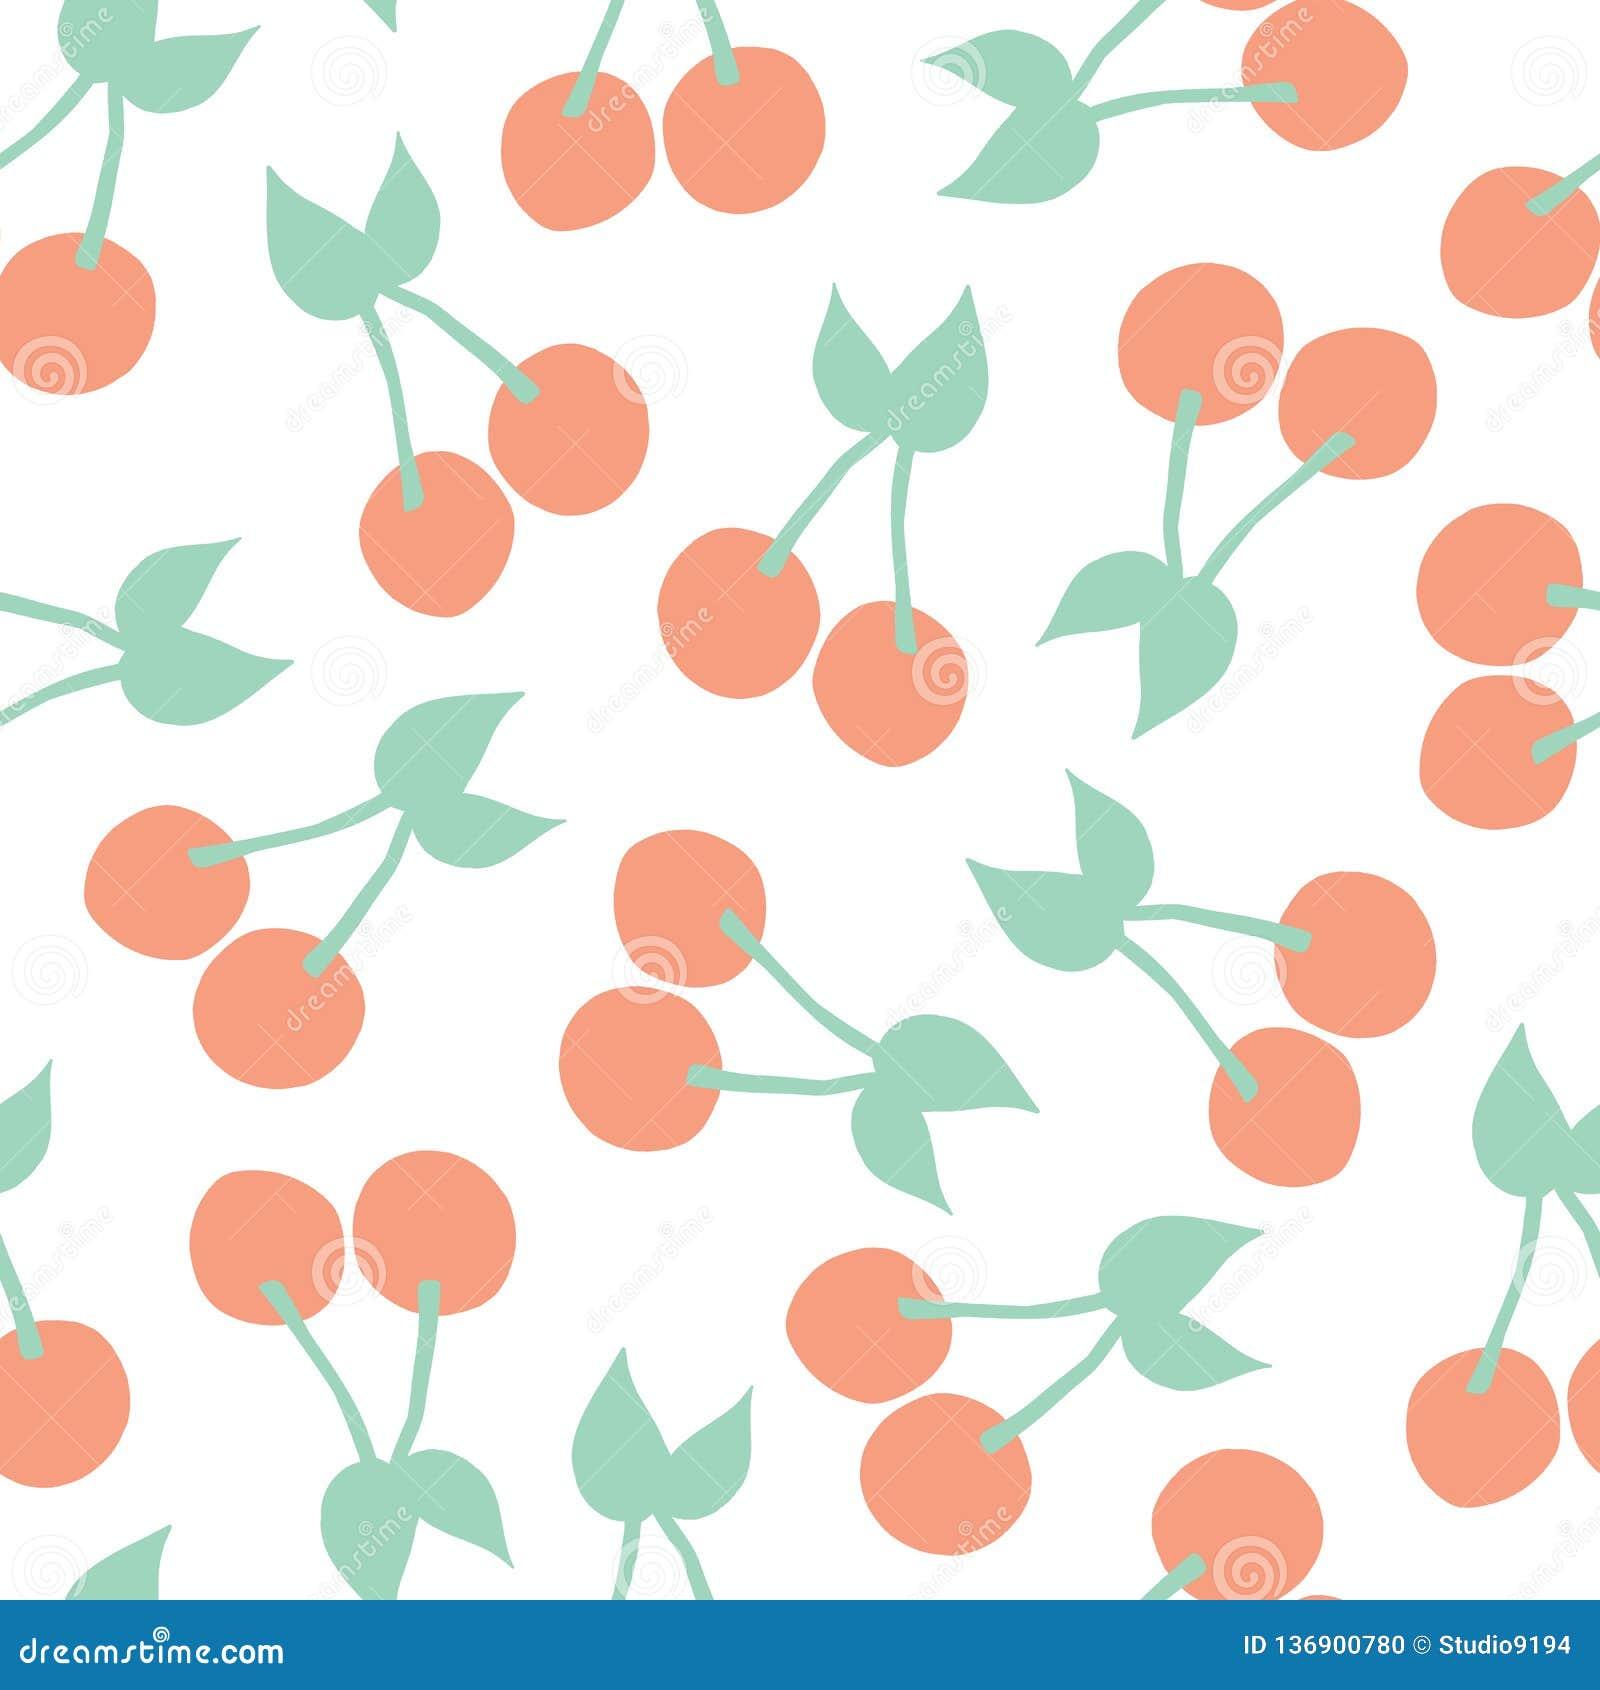 Cherries background. Vector seamless pattern